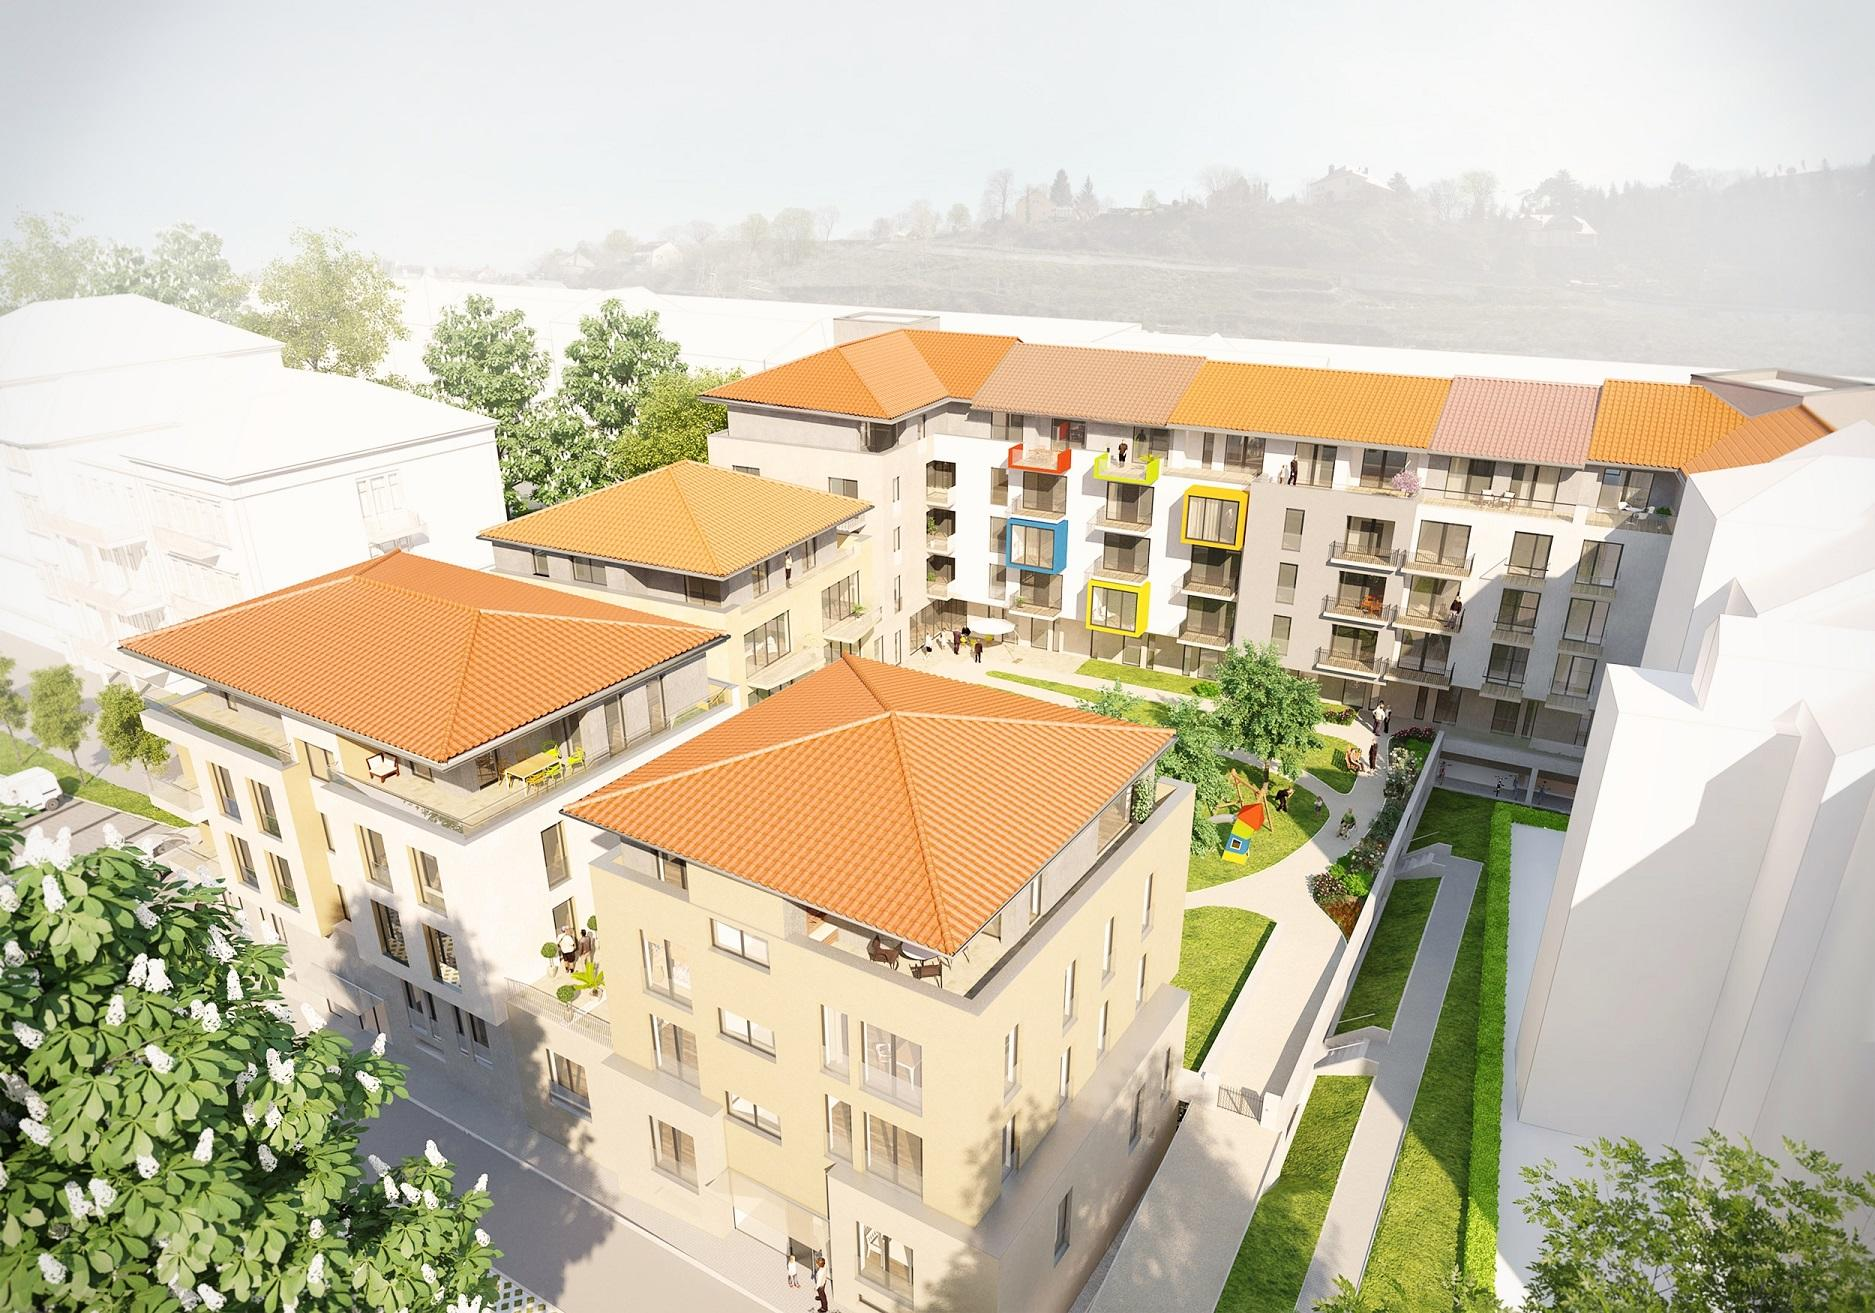 advita Quartier Neumarktschule